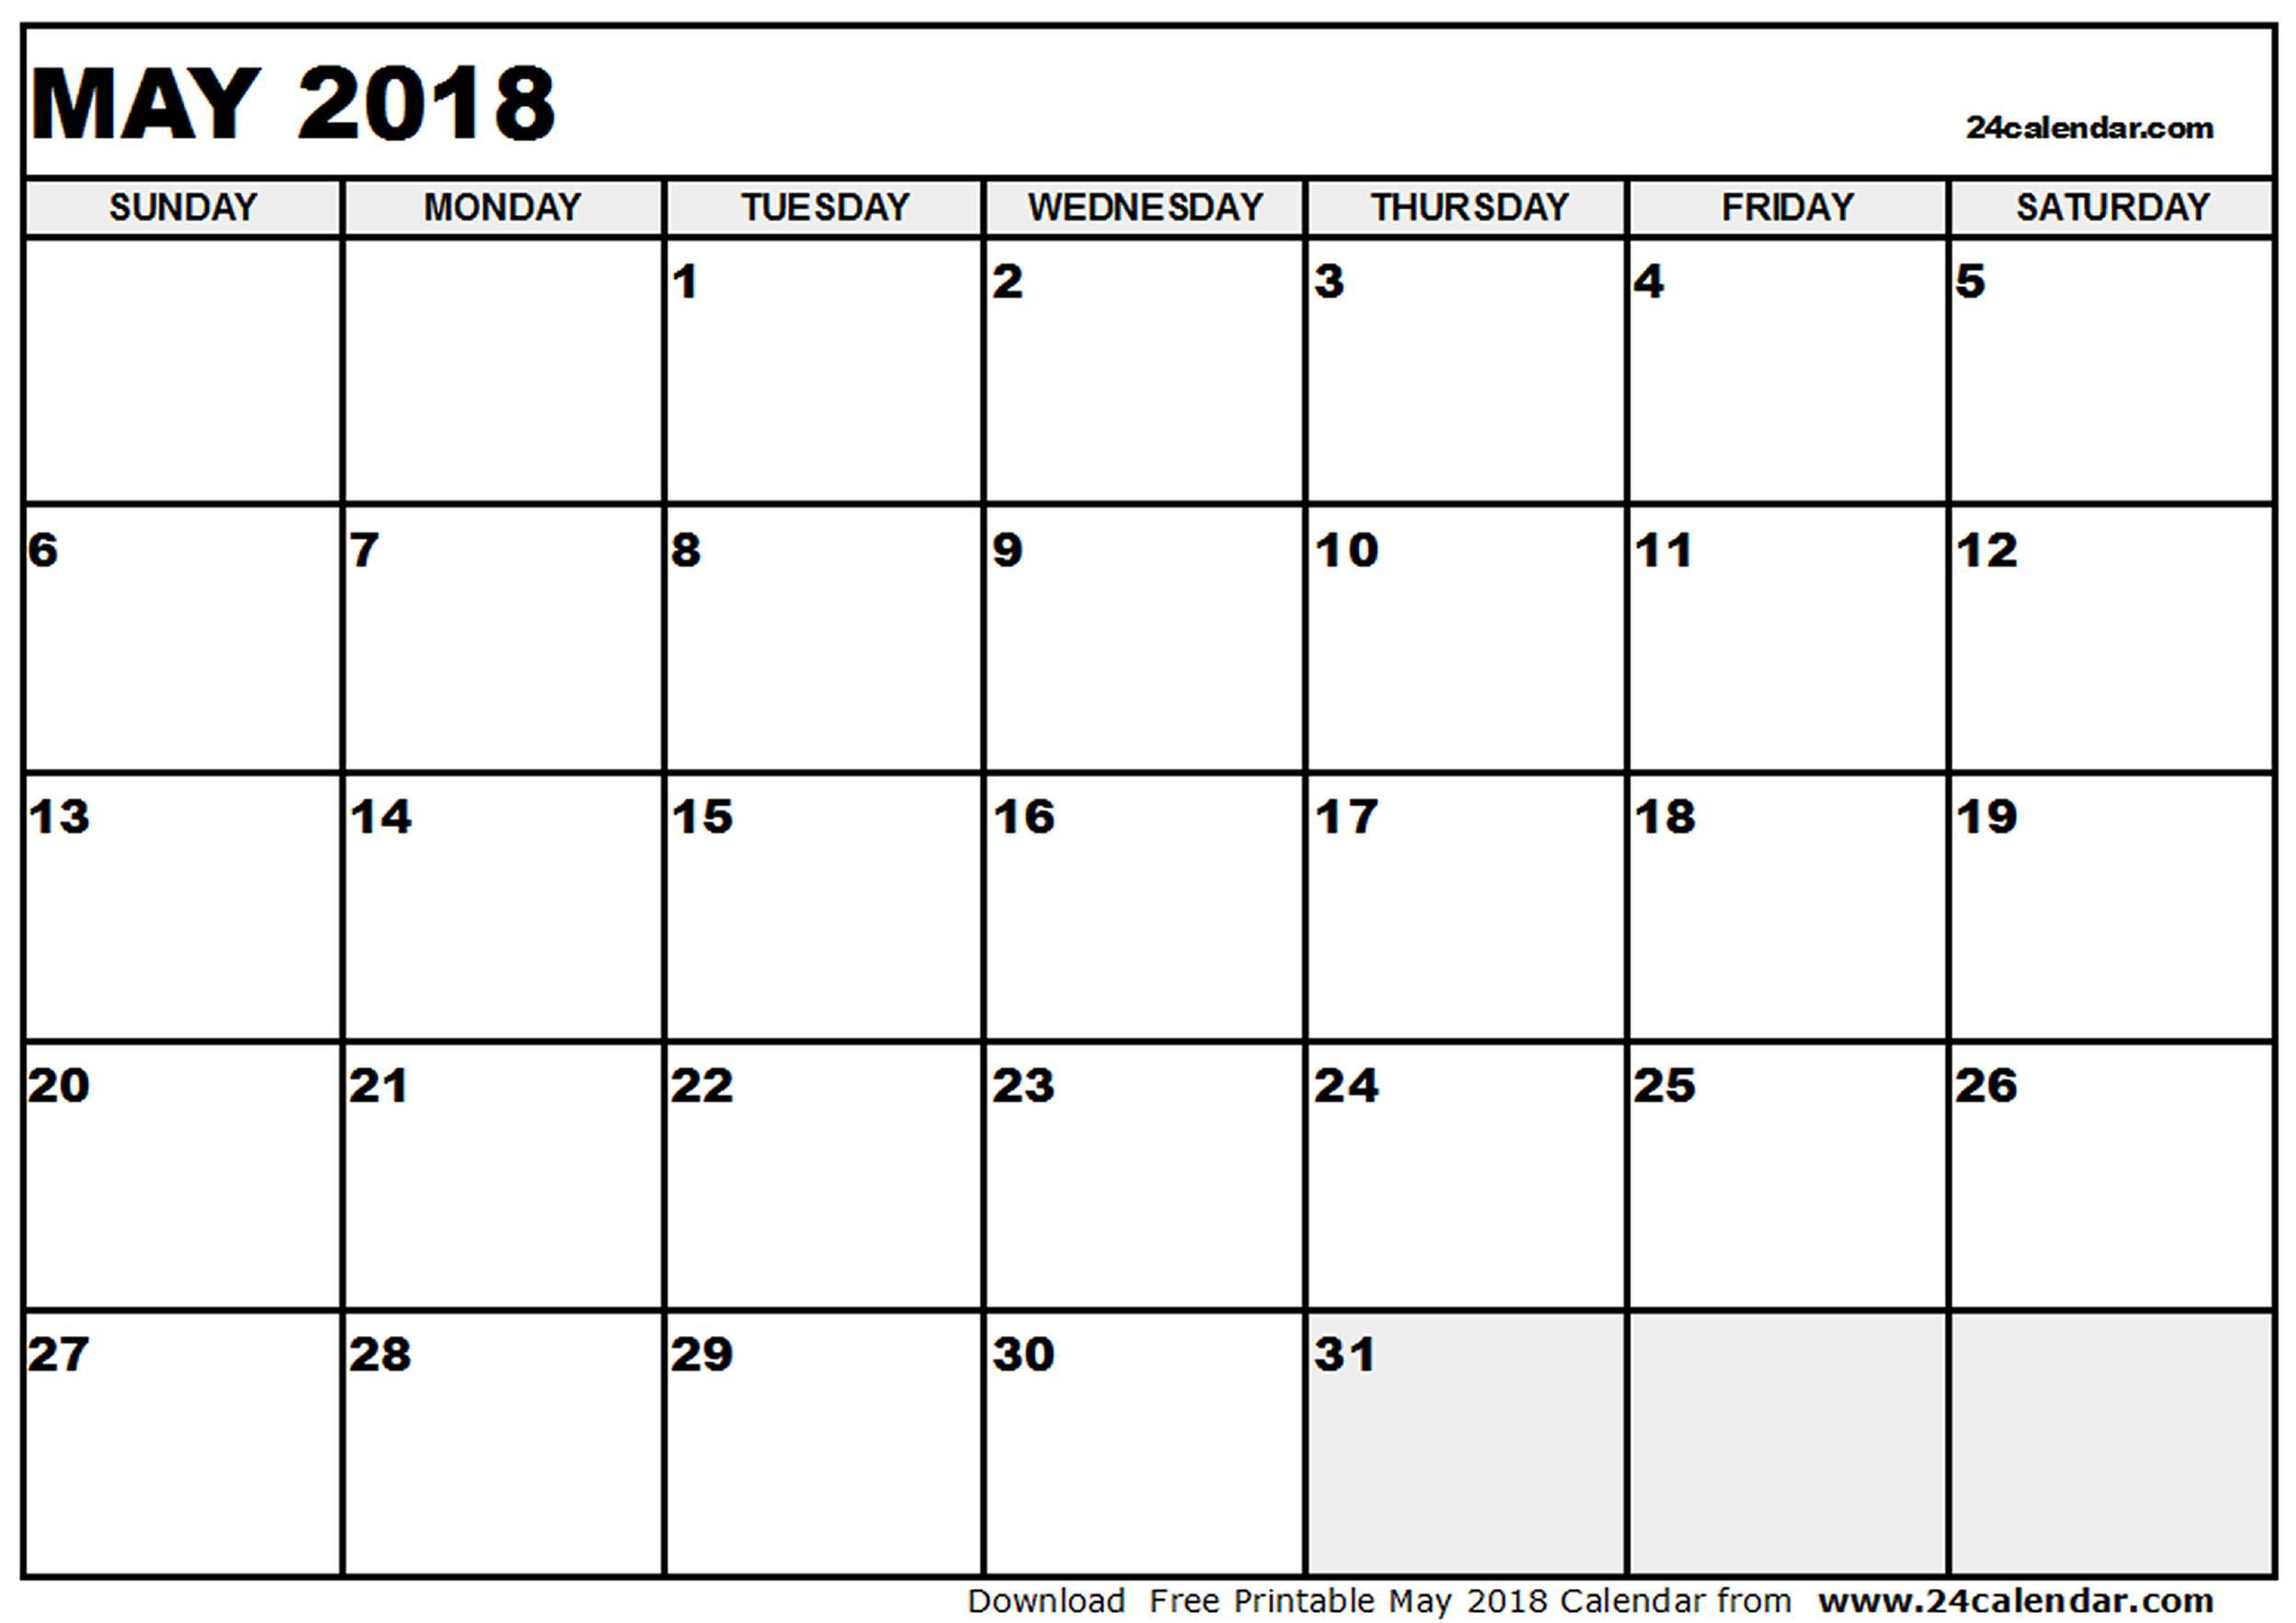 One page May 2018 calendar printable